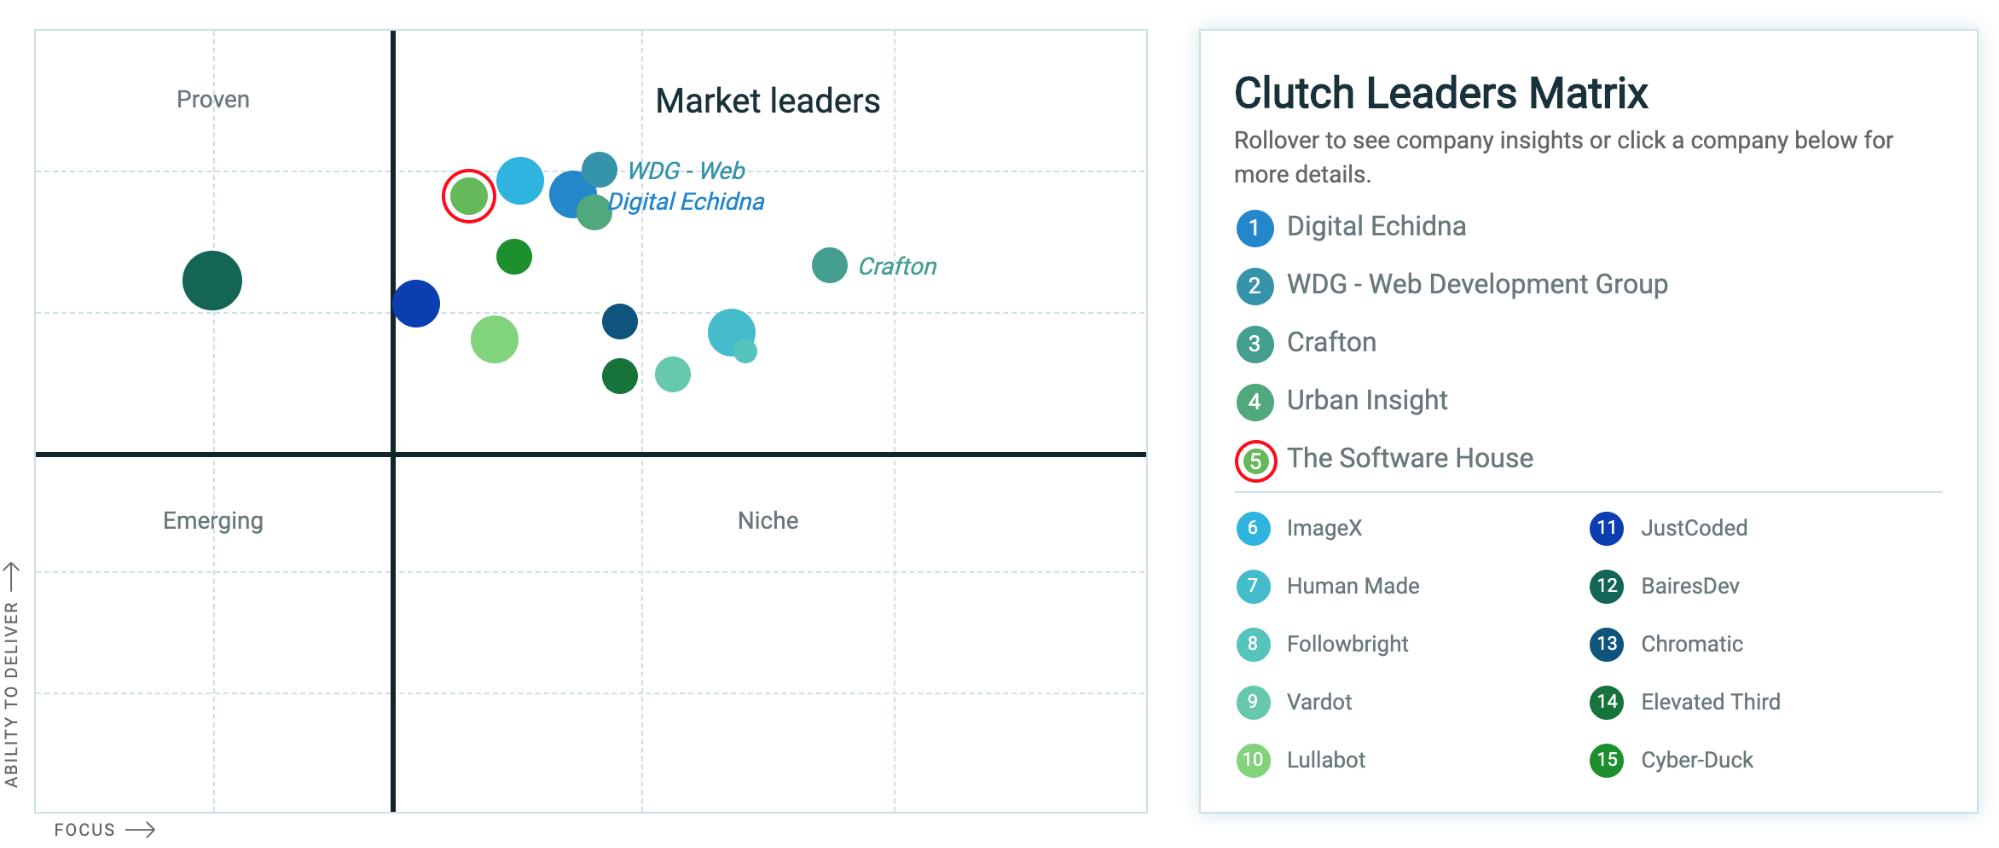 A screenshot showing Clutch market leaders matrix.